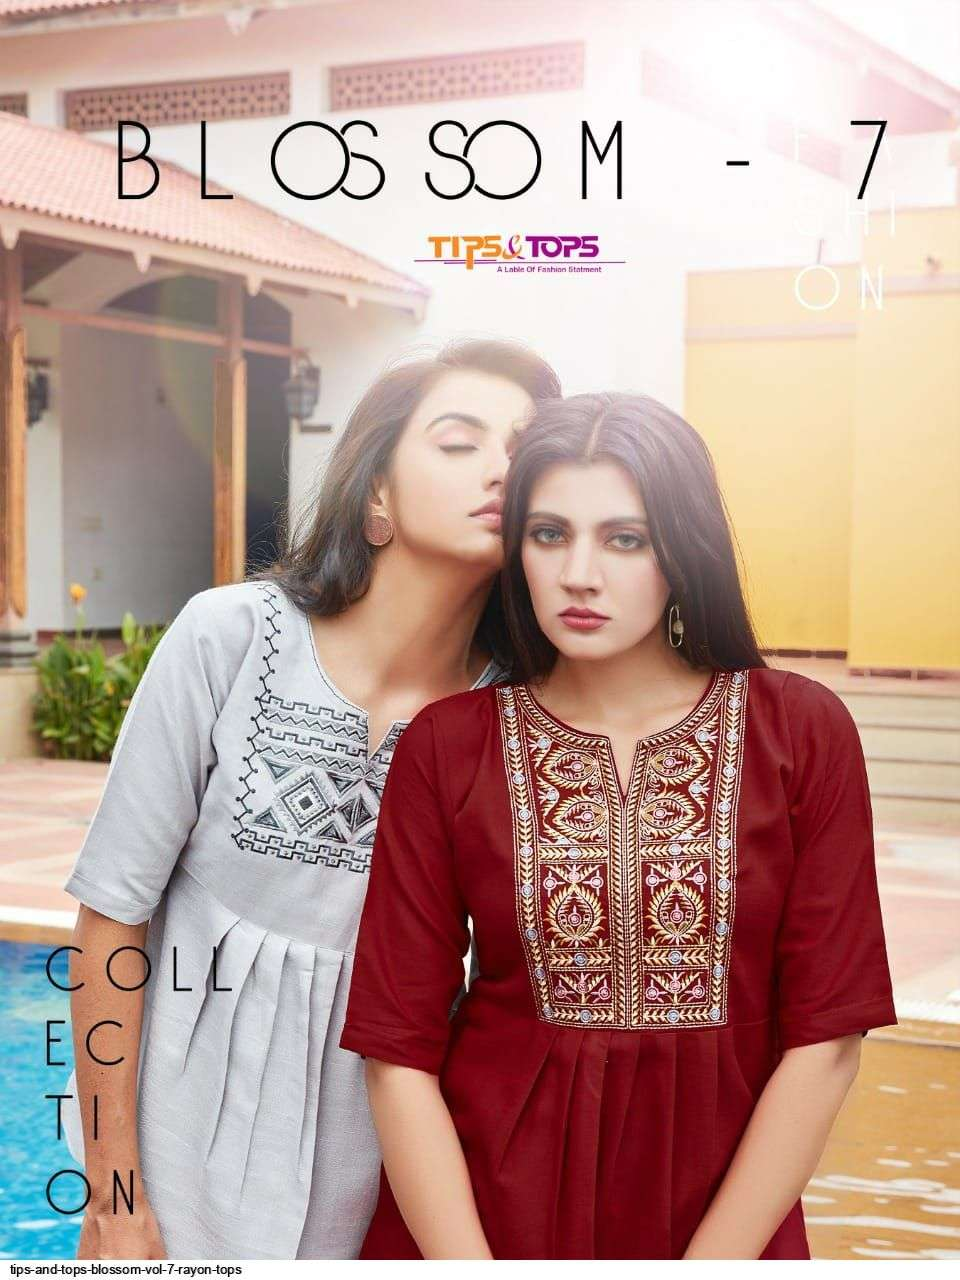 tips & tops blossom vol 7 Heavy Rayon Linen short top style kurti